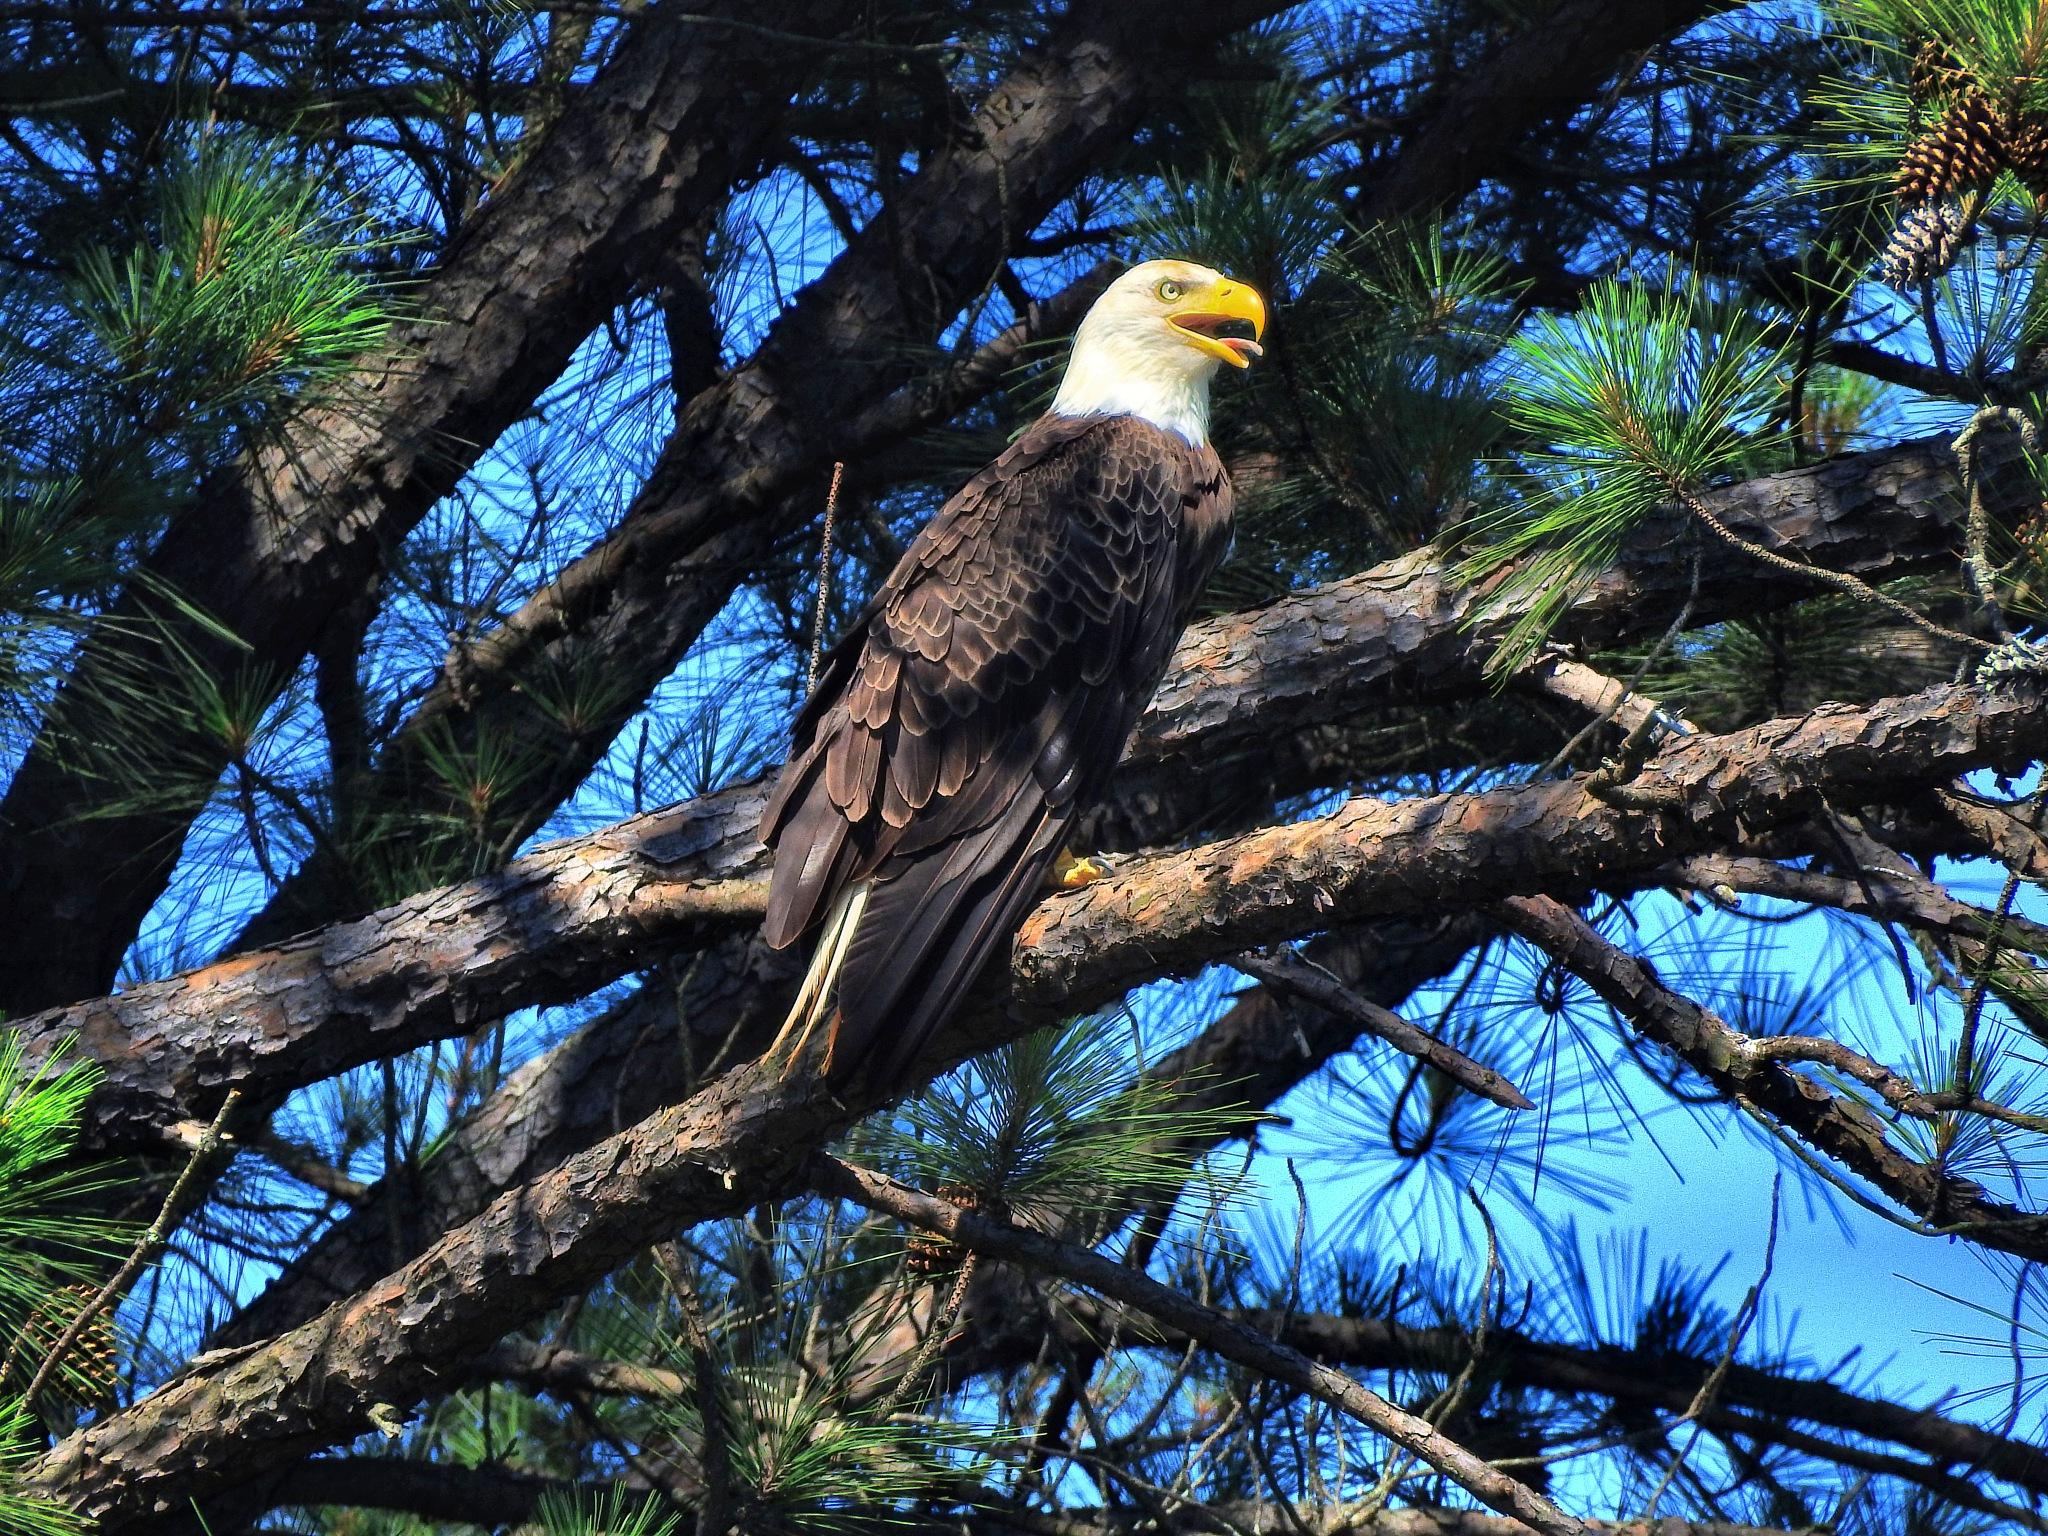 Hot Day Bald Eagle by Patty Stockton